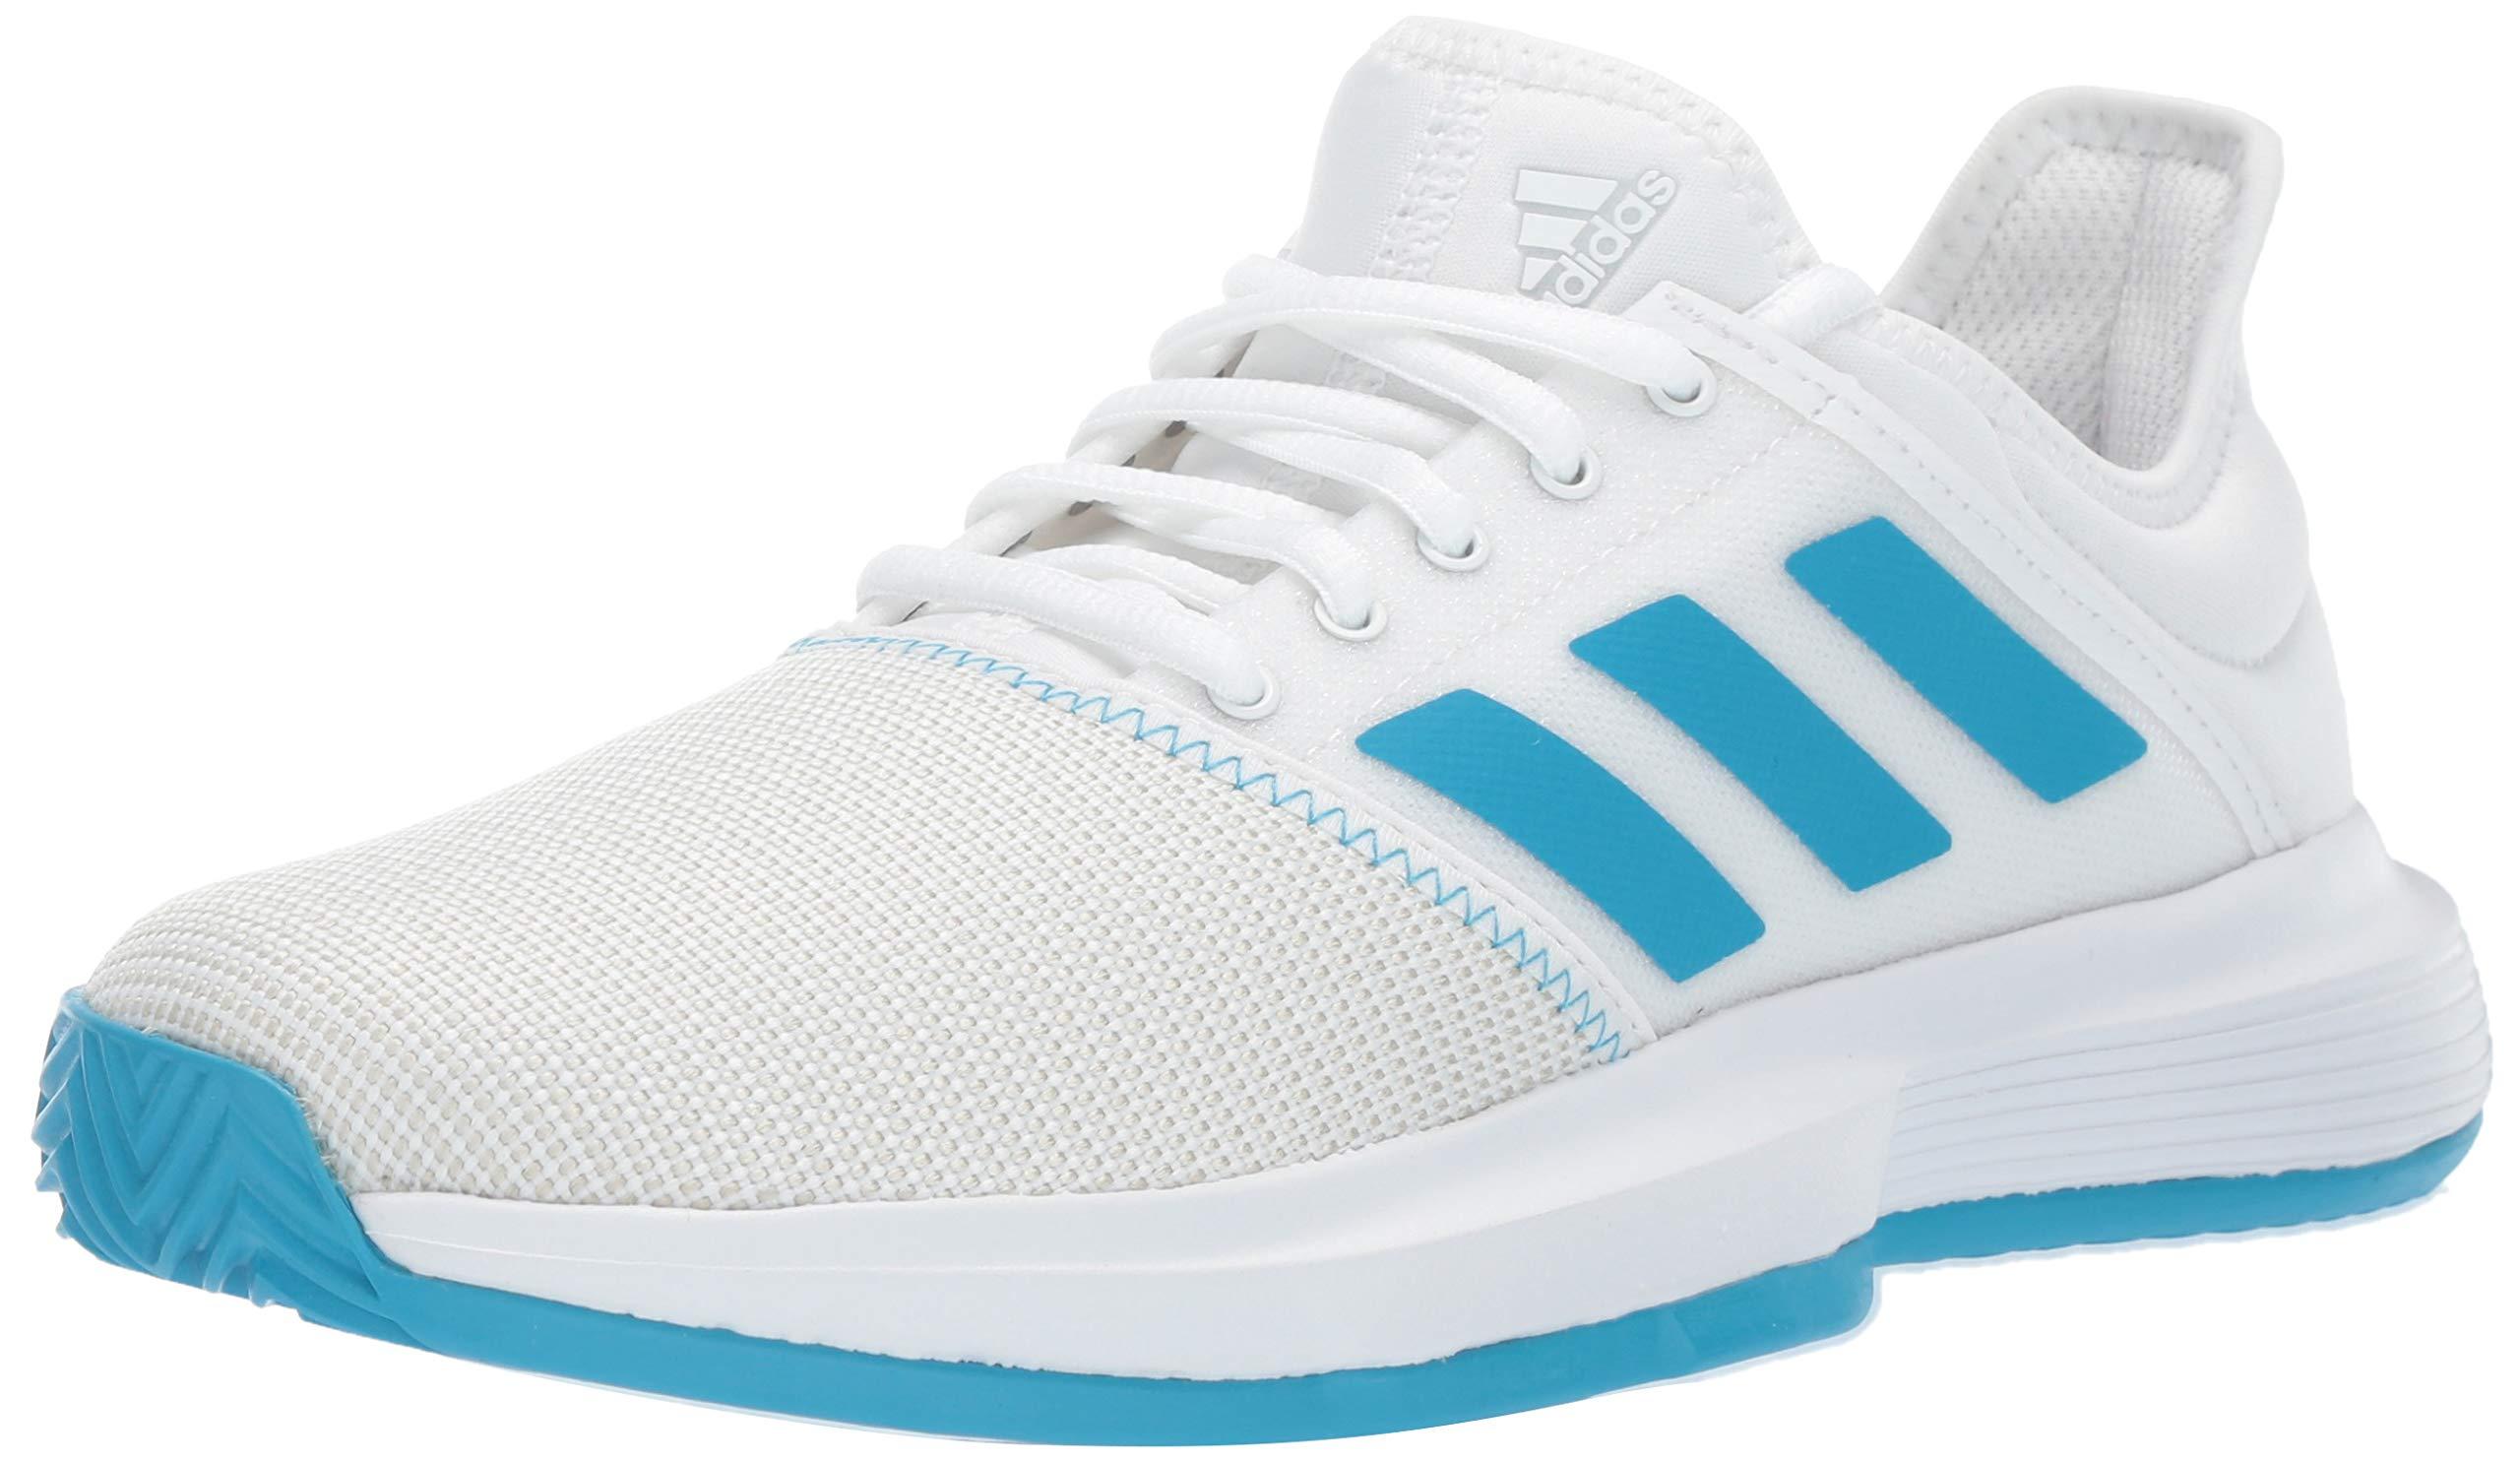 adidas Women's Gamecourt, White/Shock Cyan/Matte Silver, 5 M US